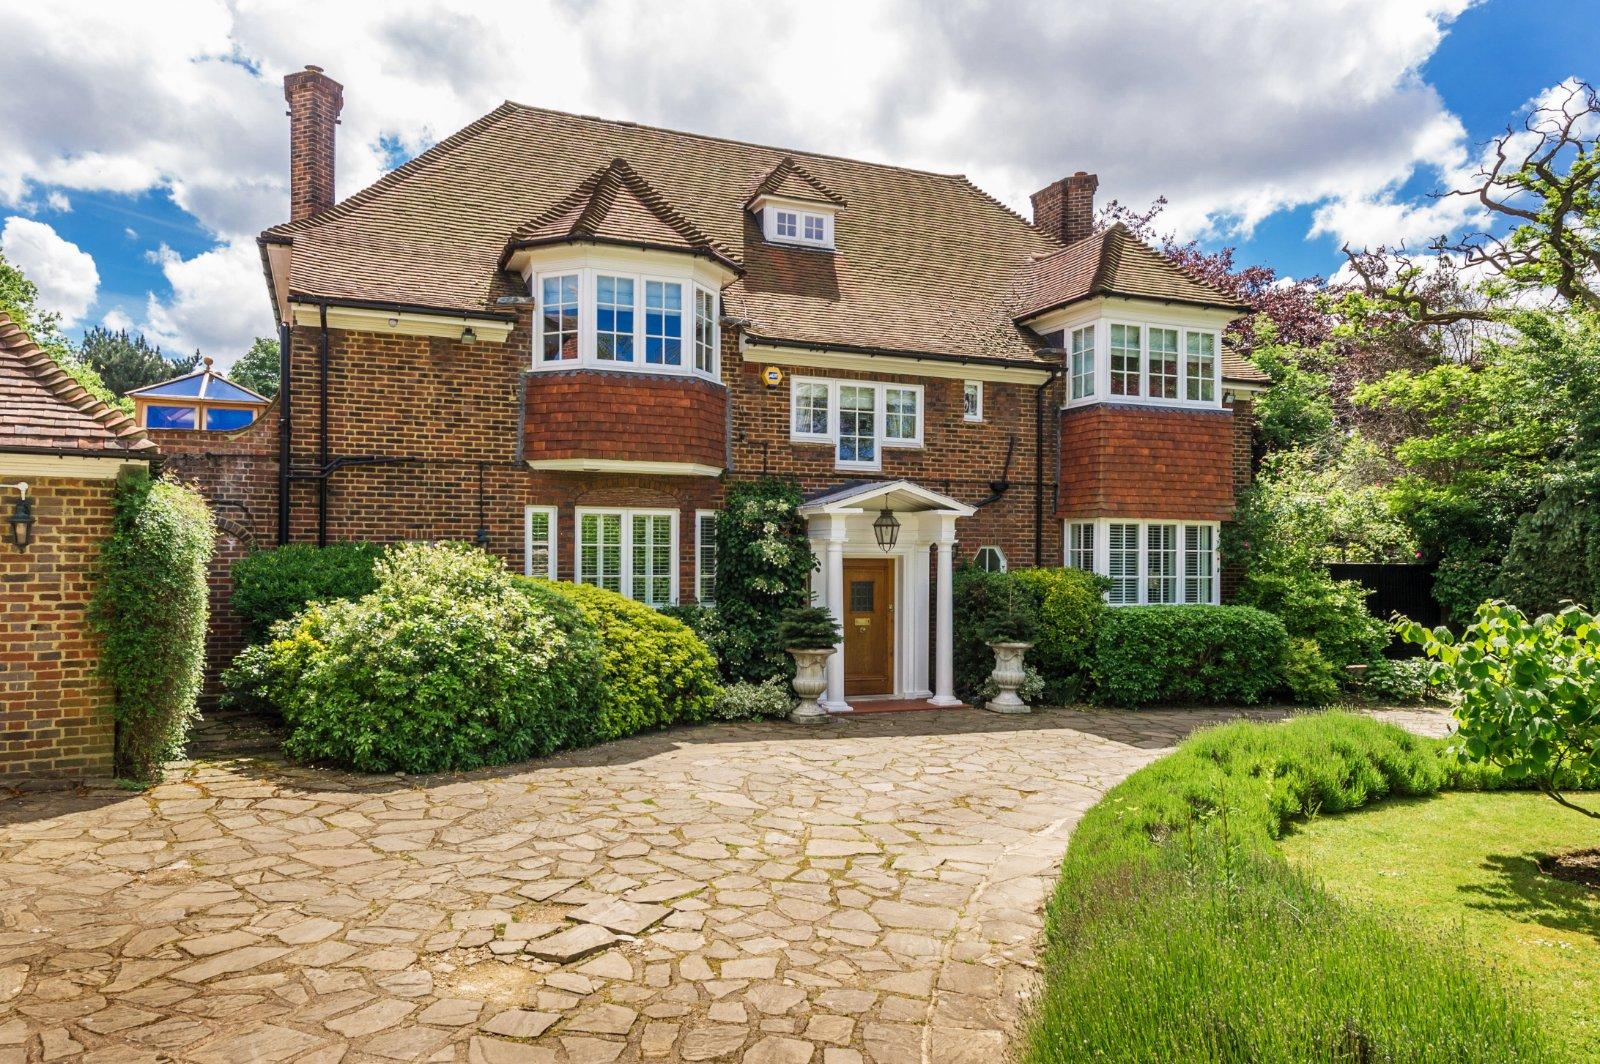 1930s mansion in South Sutton Surrey